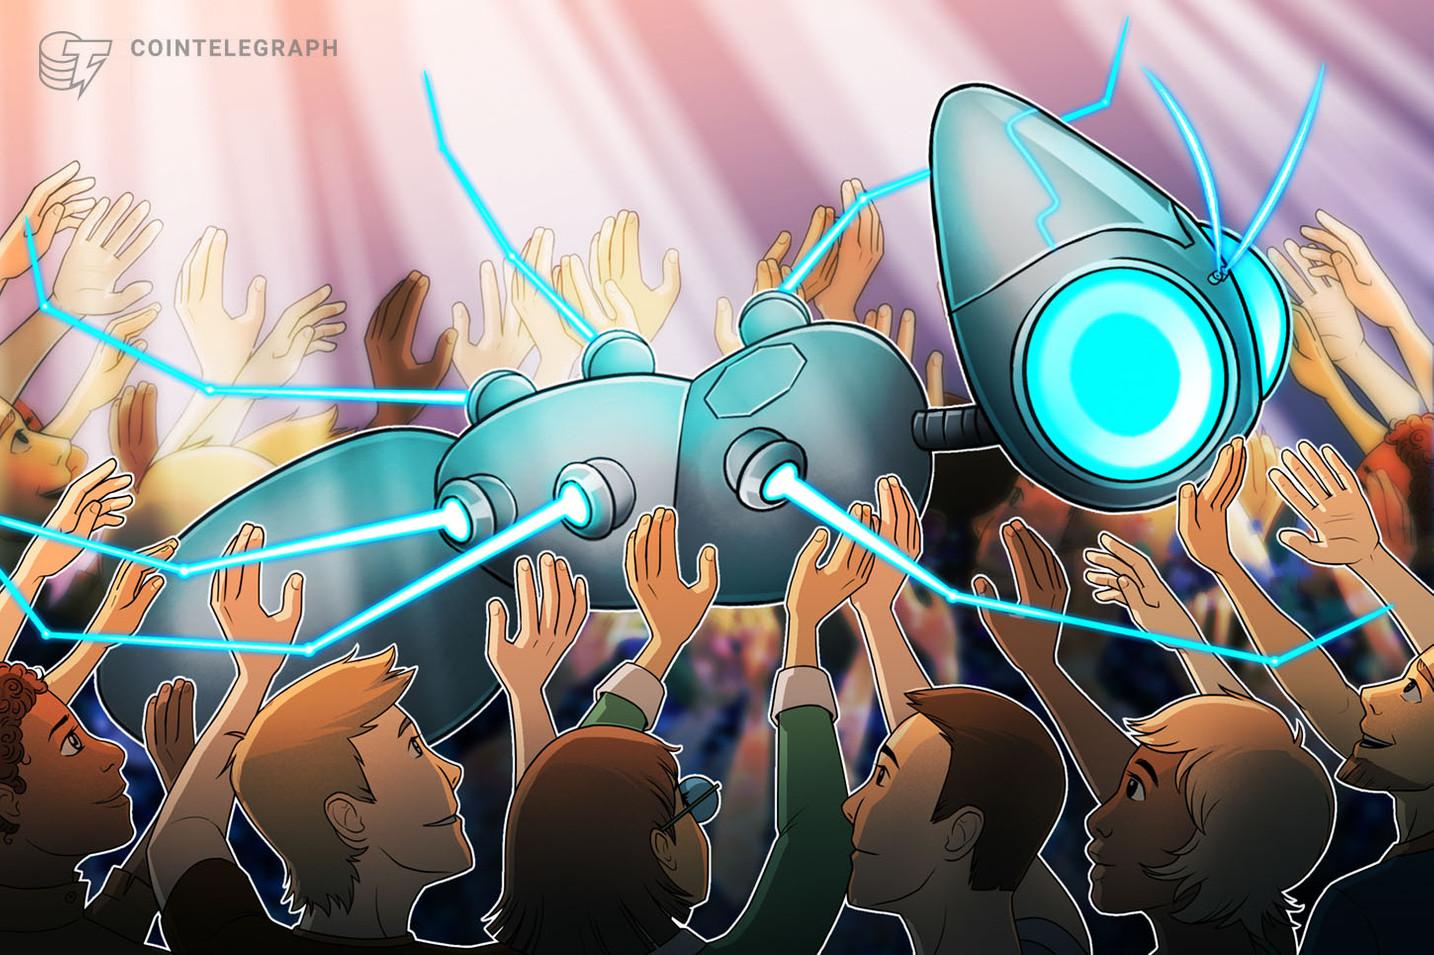 South Carolina Senate Recognizes Blockchain as Critical Emerging Tech